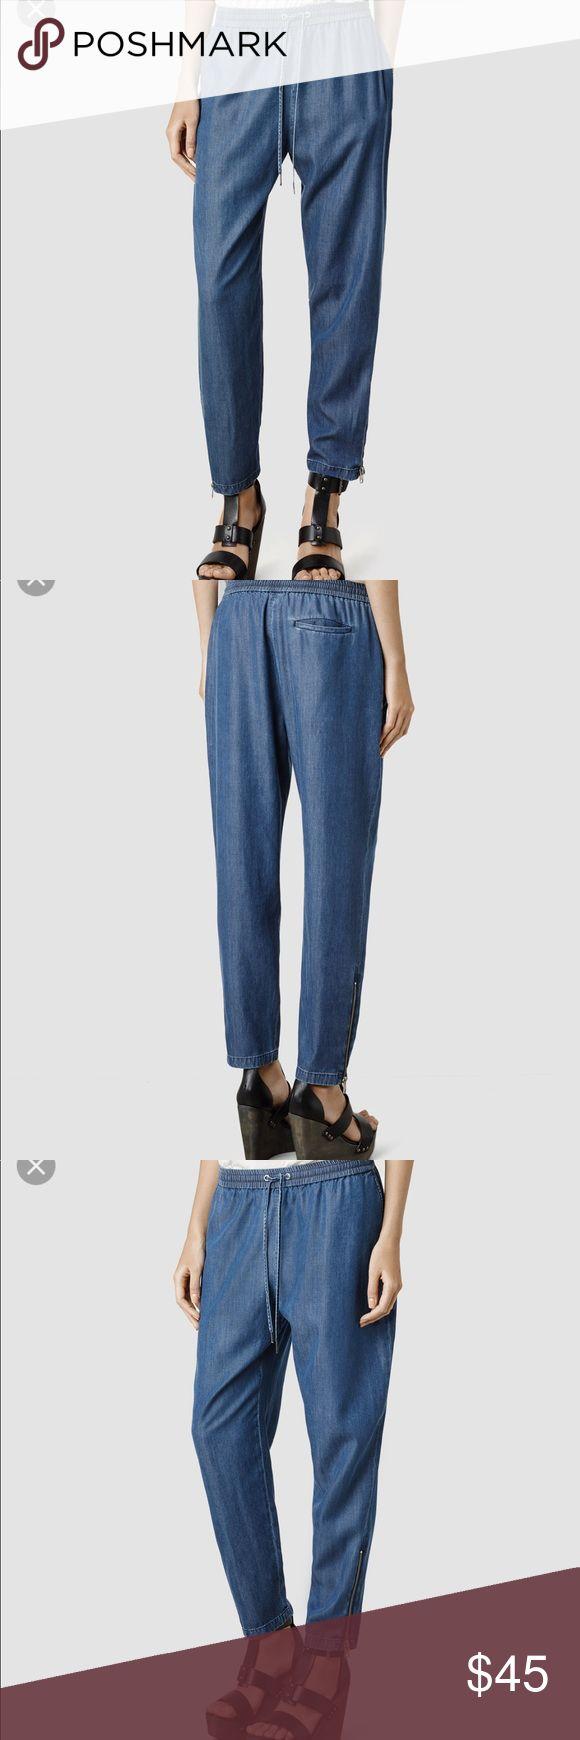 All Saints Eliza trousers Soft, faded look. US 6 All Saints Pants Trousers